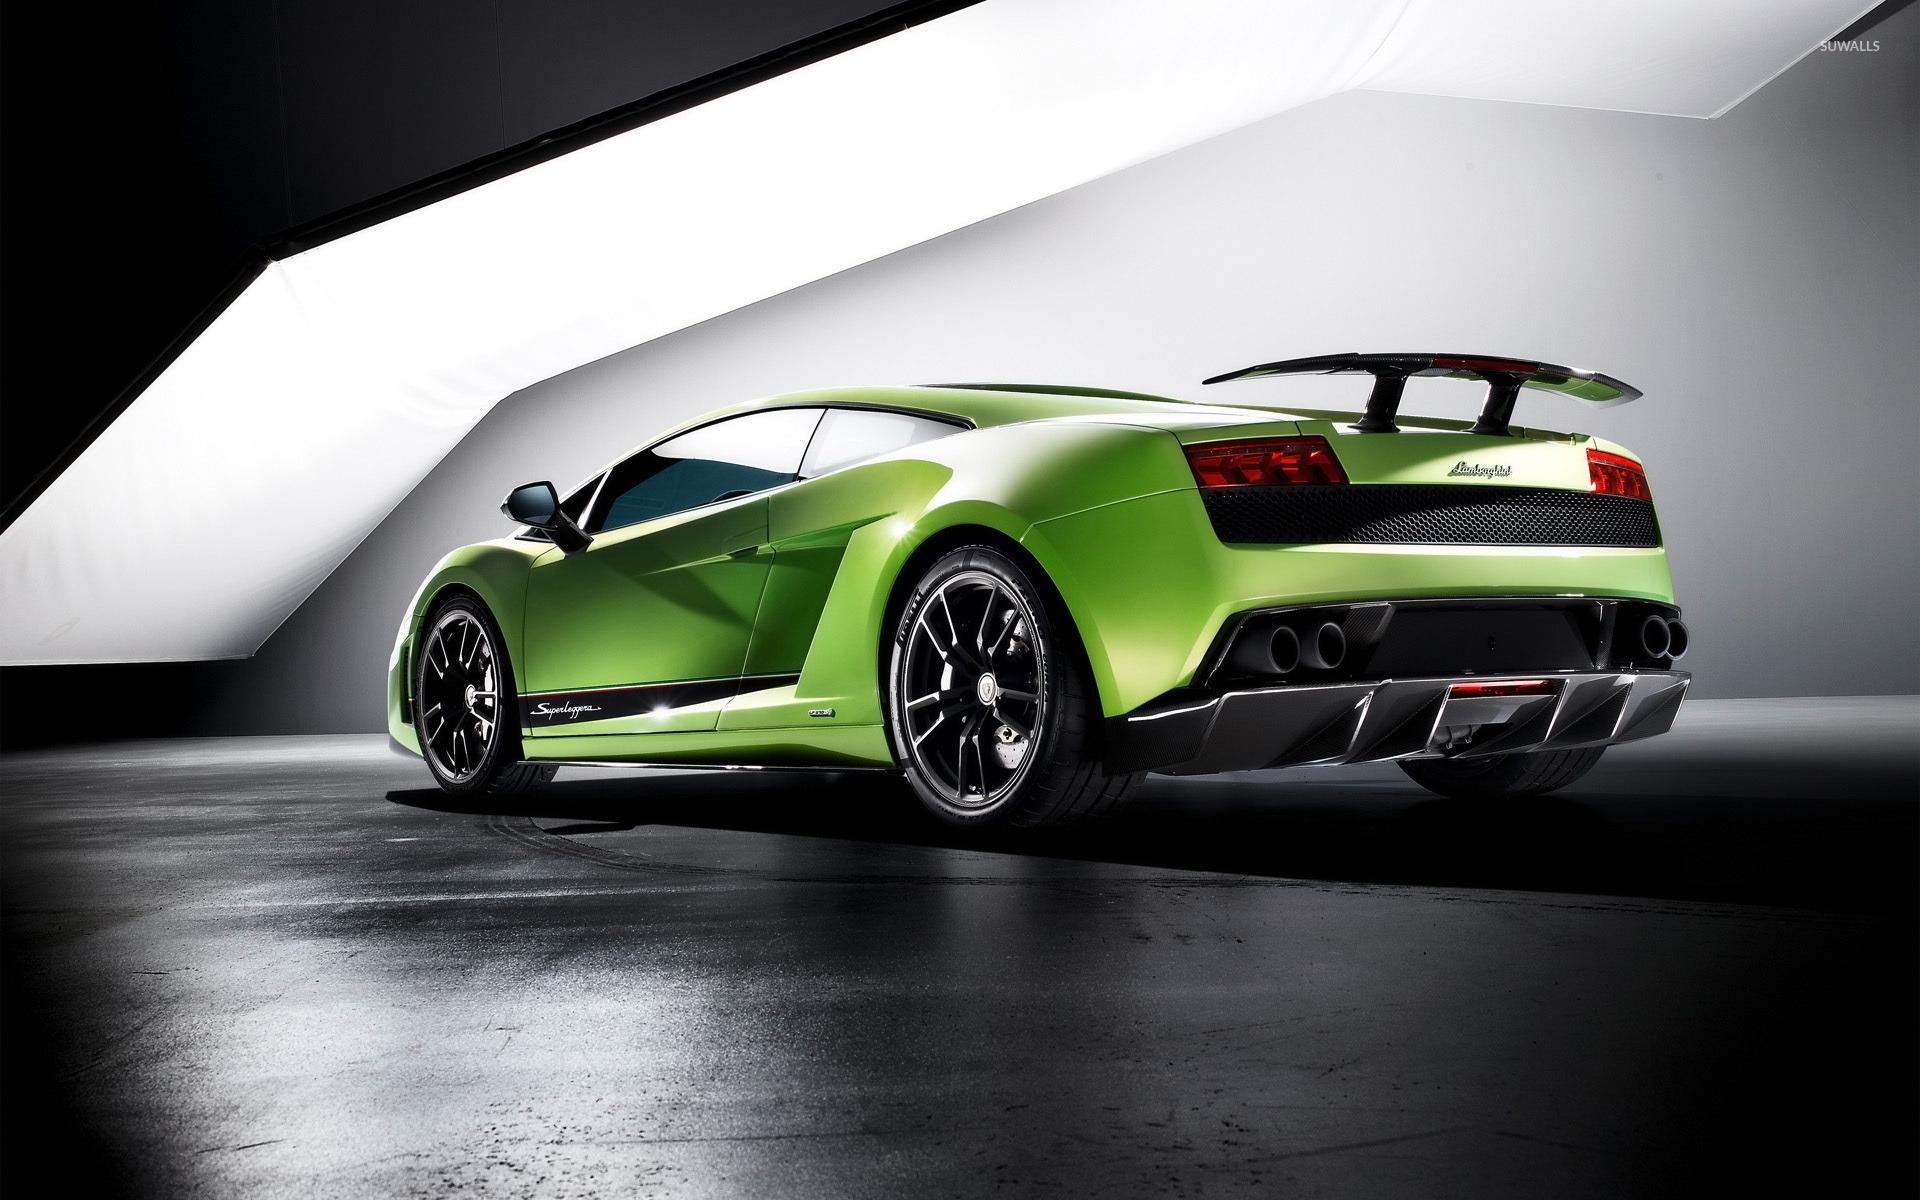 side-view-of-a-green-lamborghini-gallardo-superleggera-51179-1920x1200 Inspiring Bugatti Veyron Vs Lamborghini Gallardo Cars Trend